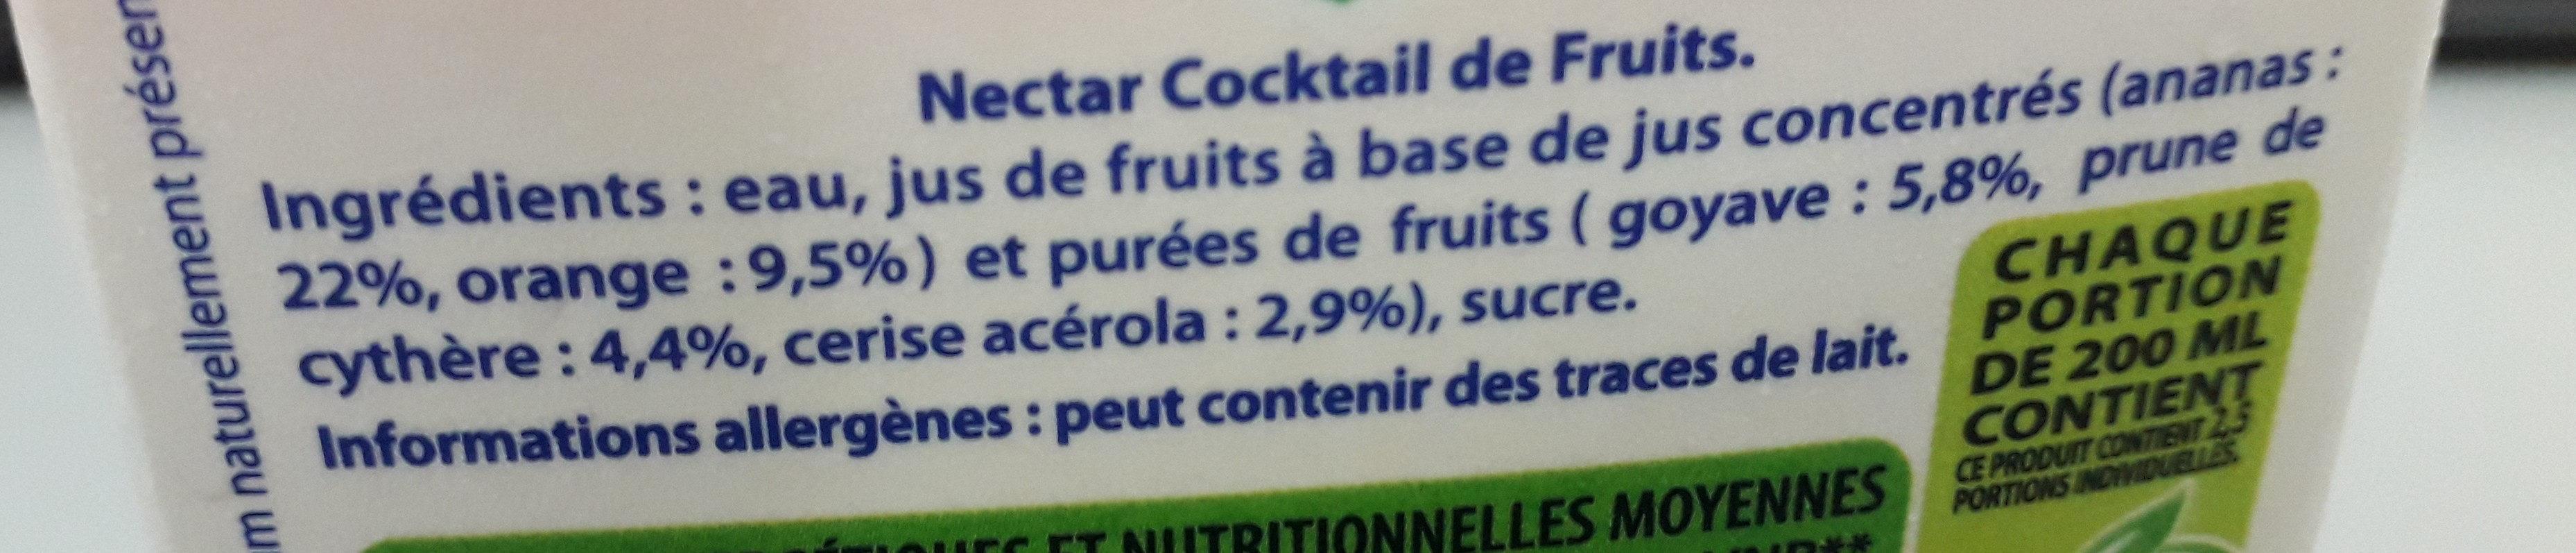 nectar Cocktail de fruits - Ingredienti - fr